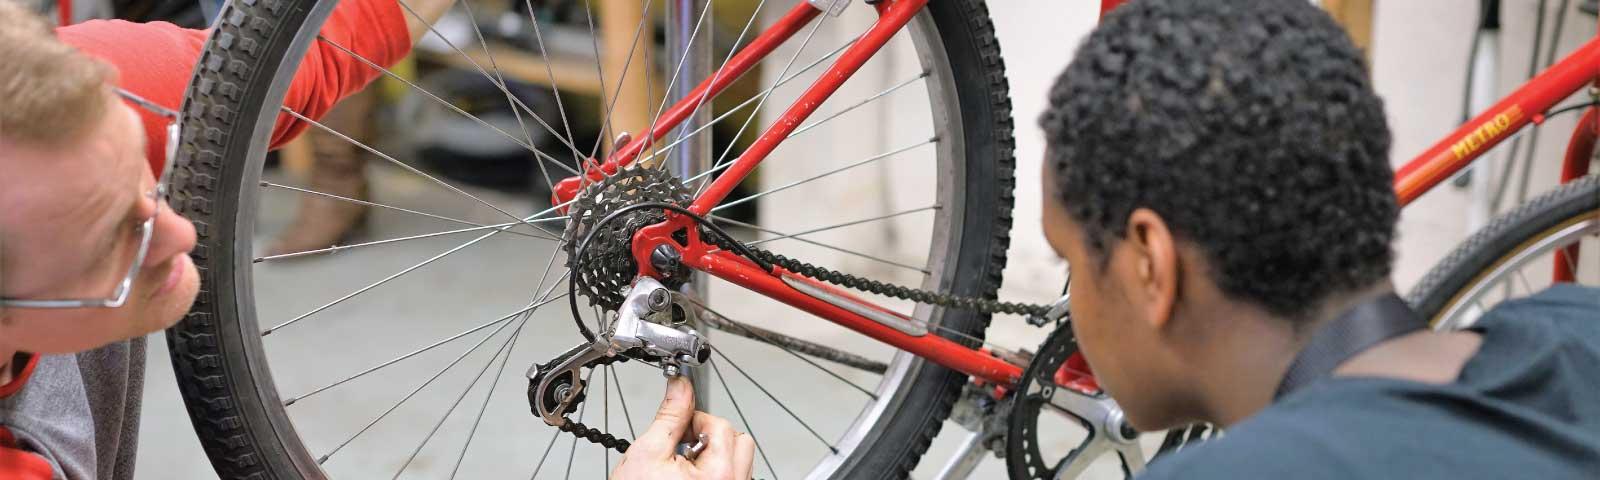 Job Skills Training teach bike repair to young adults